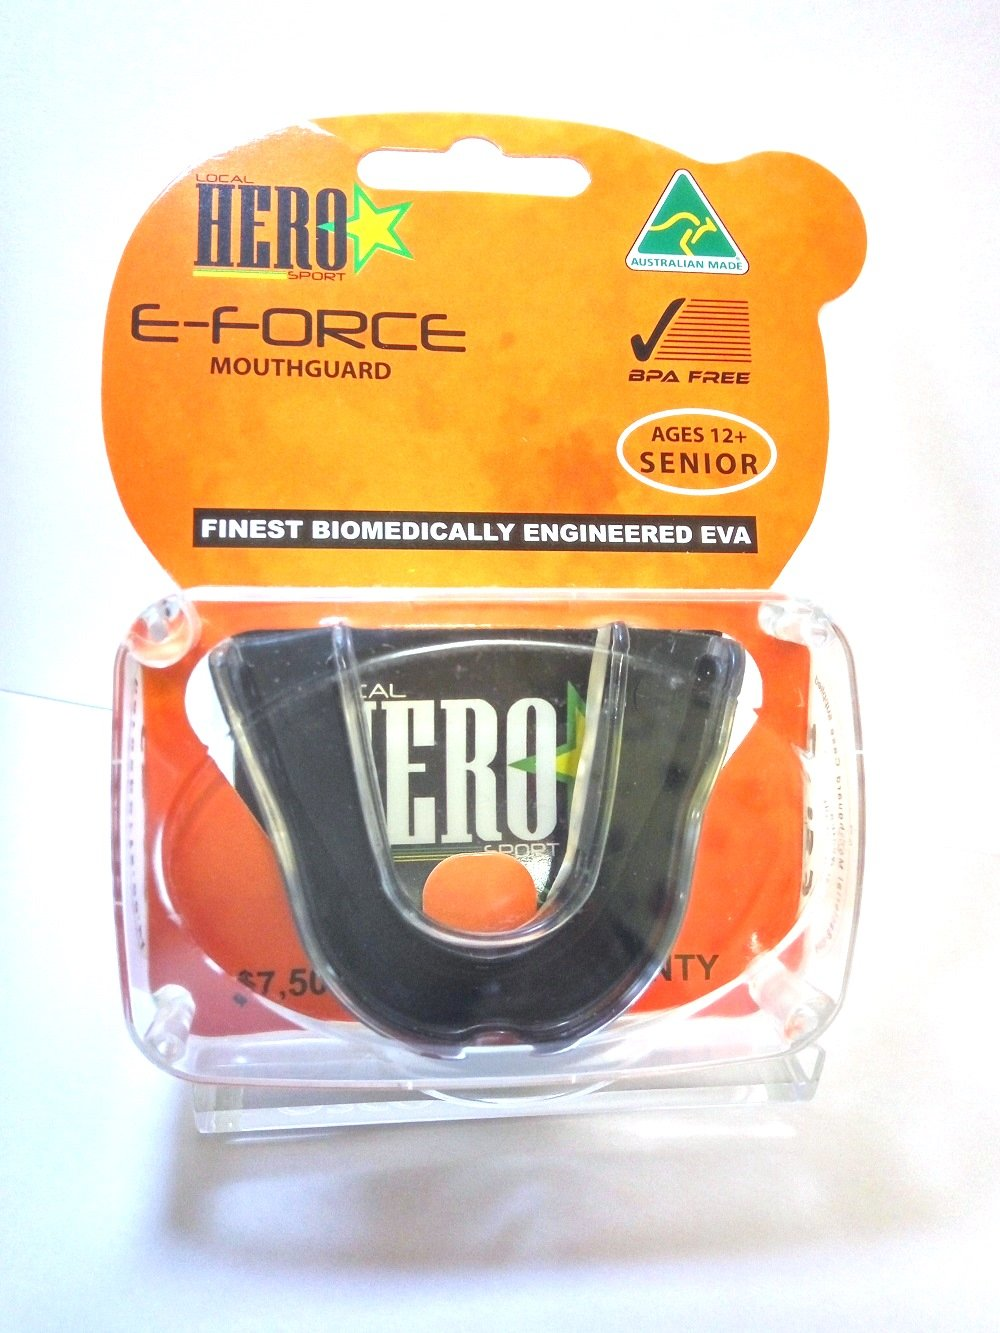 e-force Mouthguards LOCAL HERO SPORTS AUSTRALIA